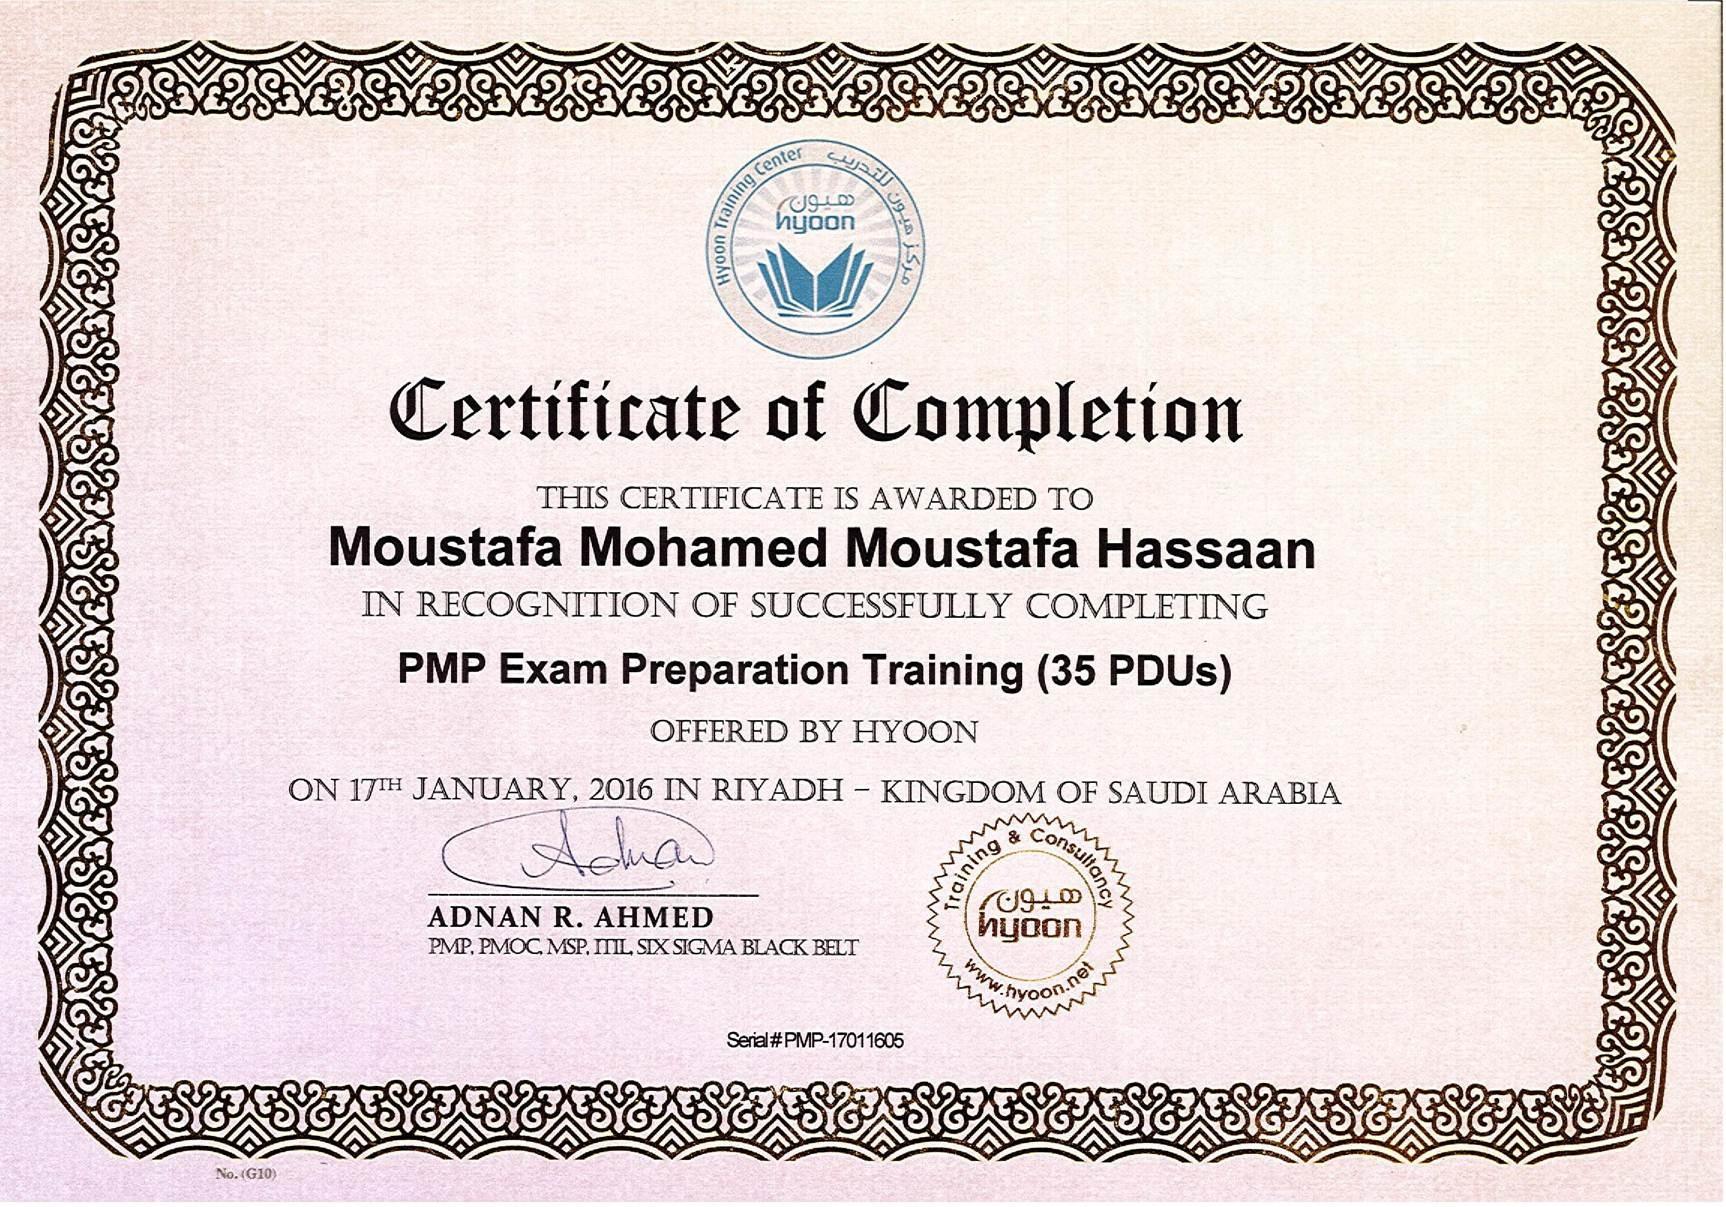 Moustafa hassan bayt pmp training certificate xflitez Gallery